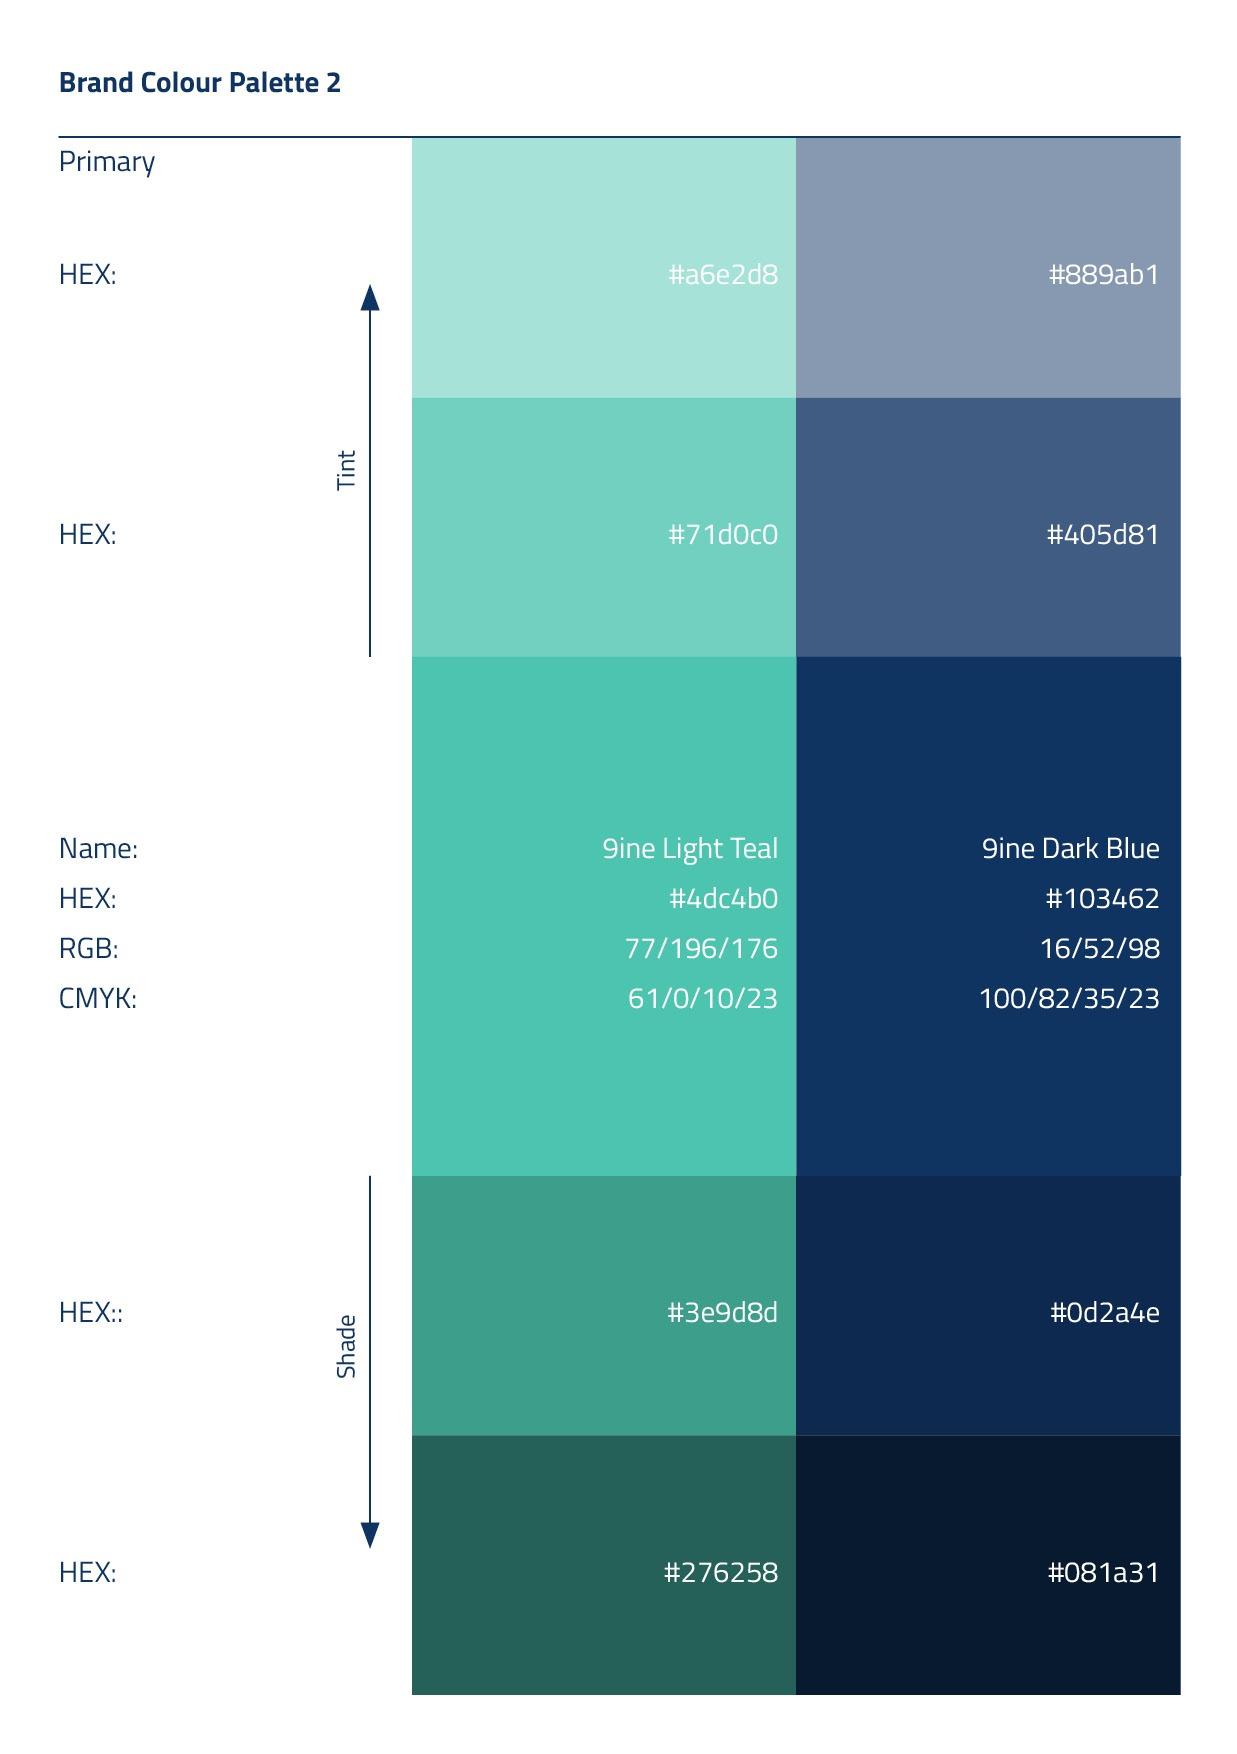 Branding Guidelines Colour